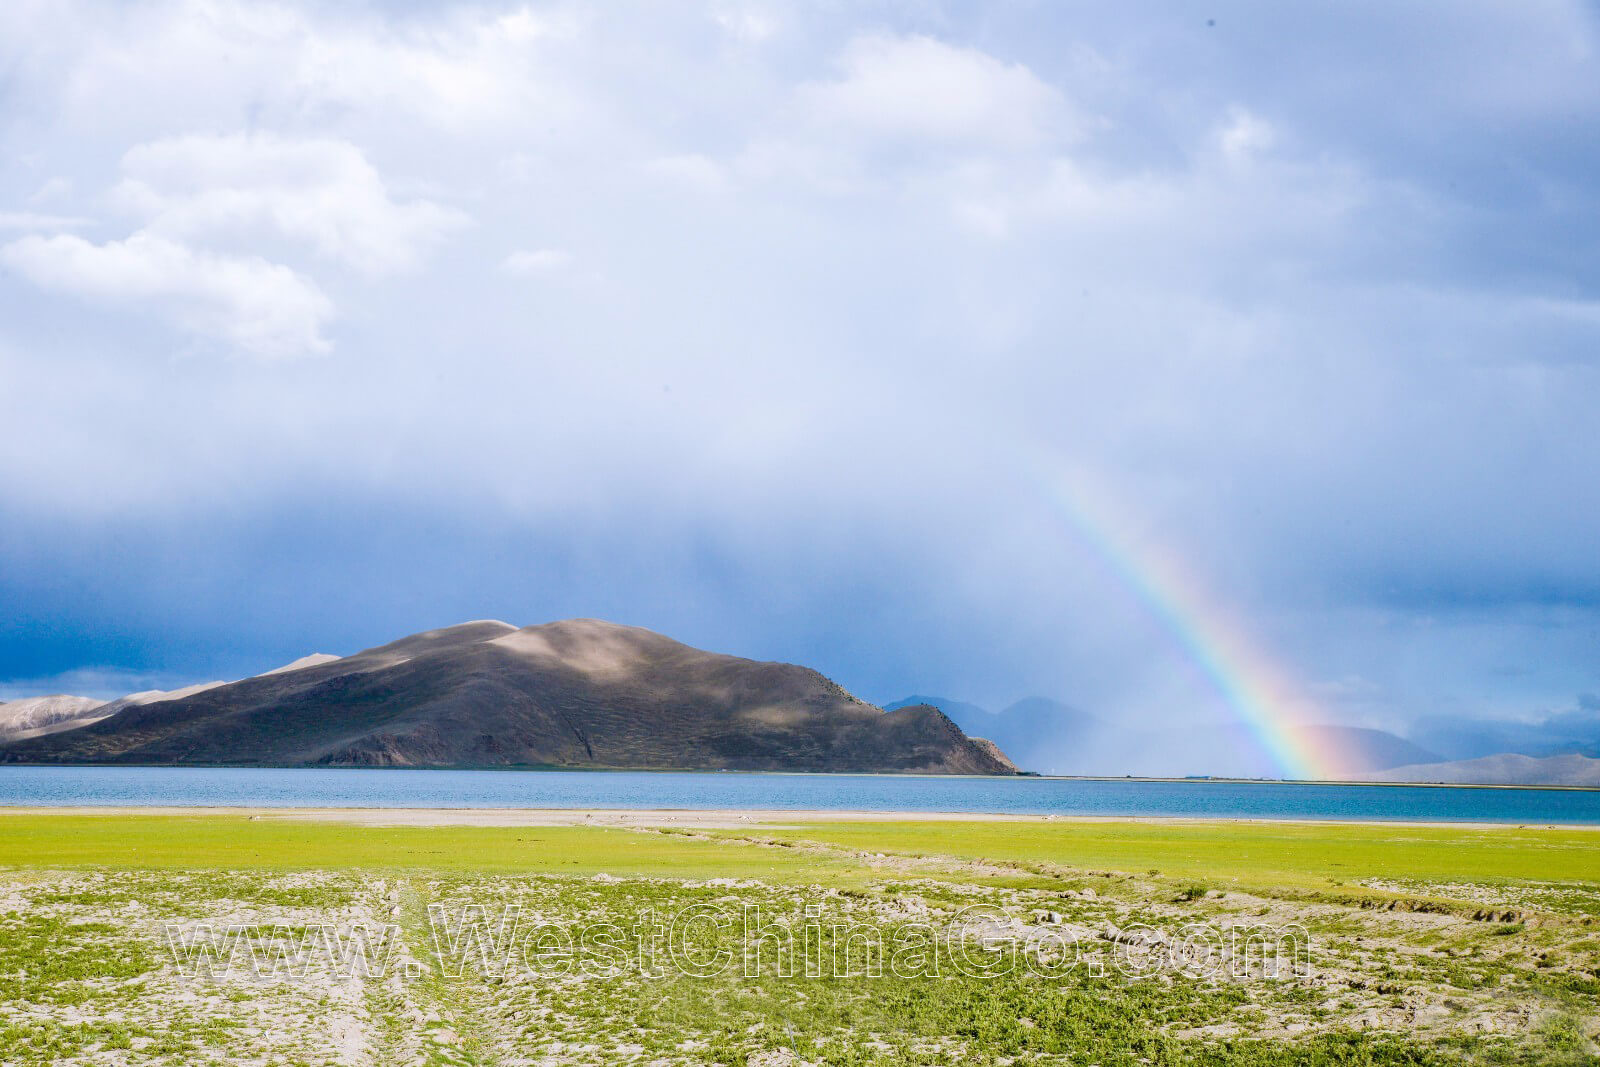 Tibet Yamdrok Tso Lake:Yamdrok Yumtso